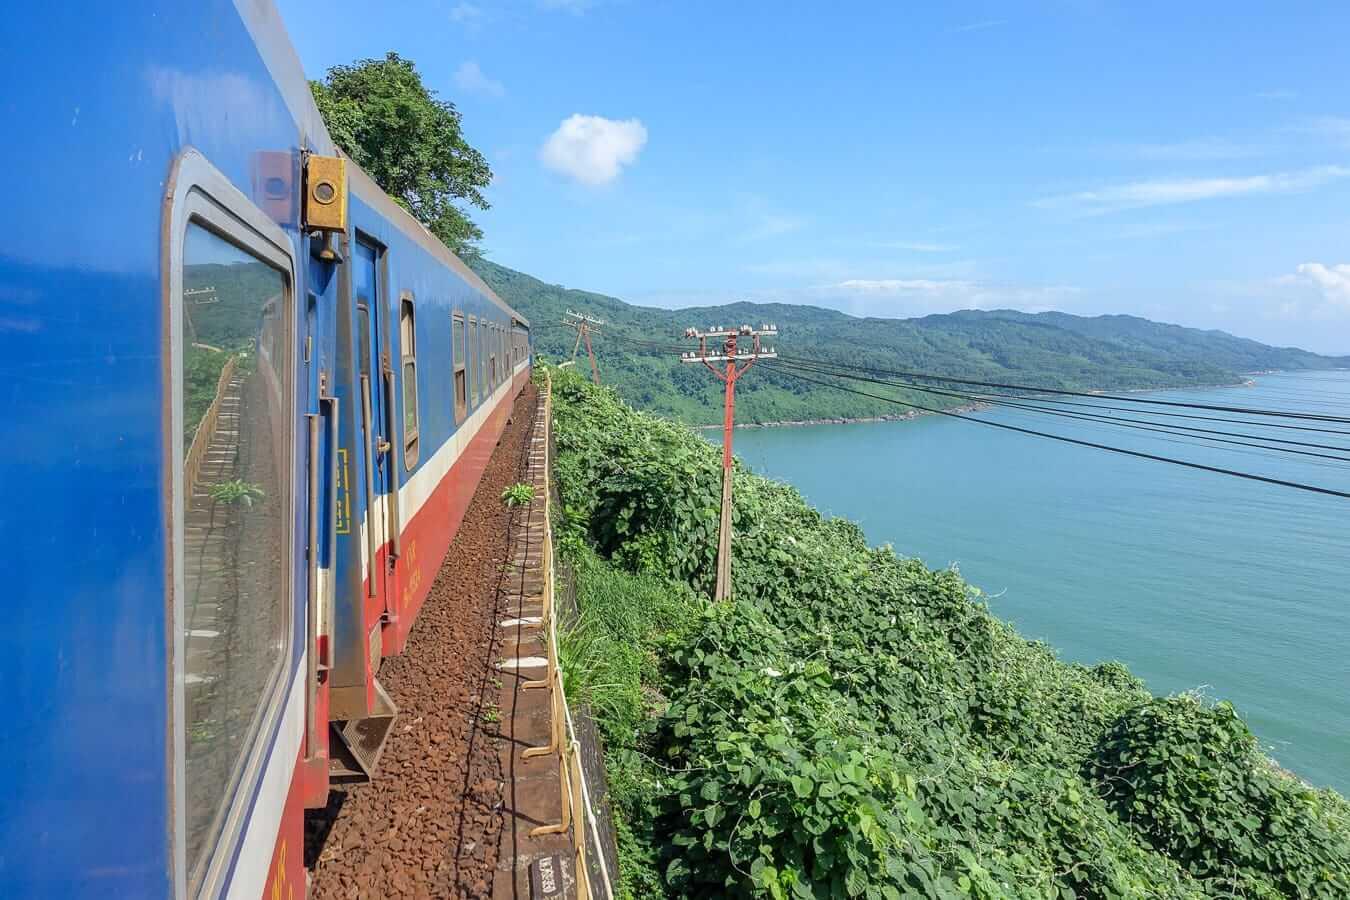 Hue to Da Nang over the Hai Van Pass